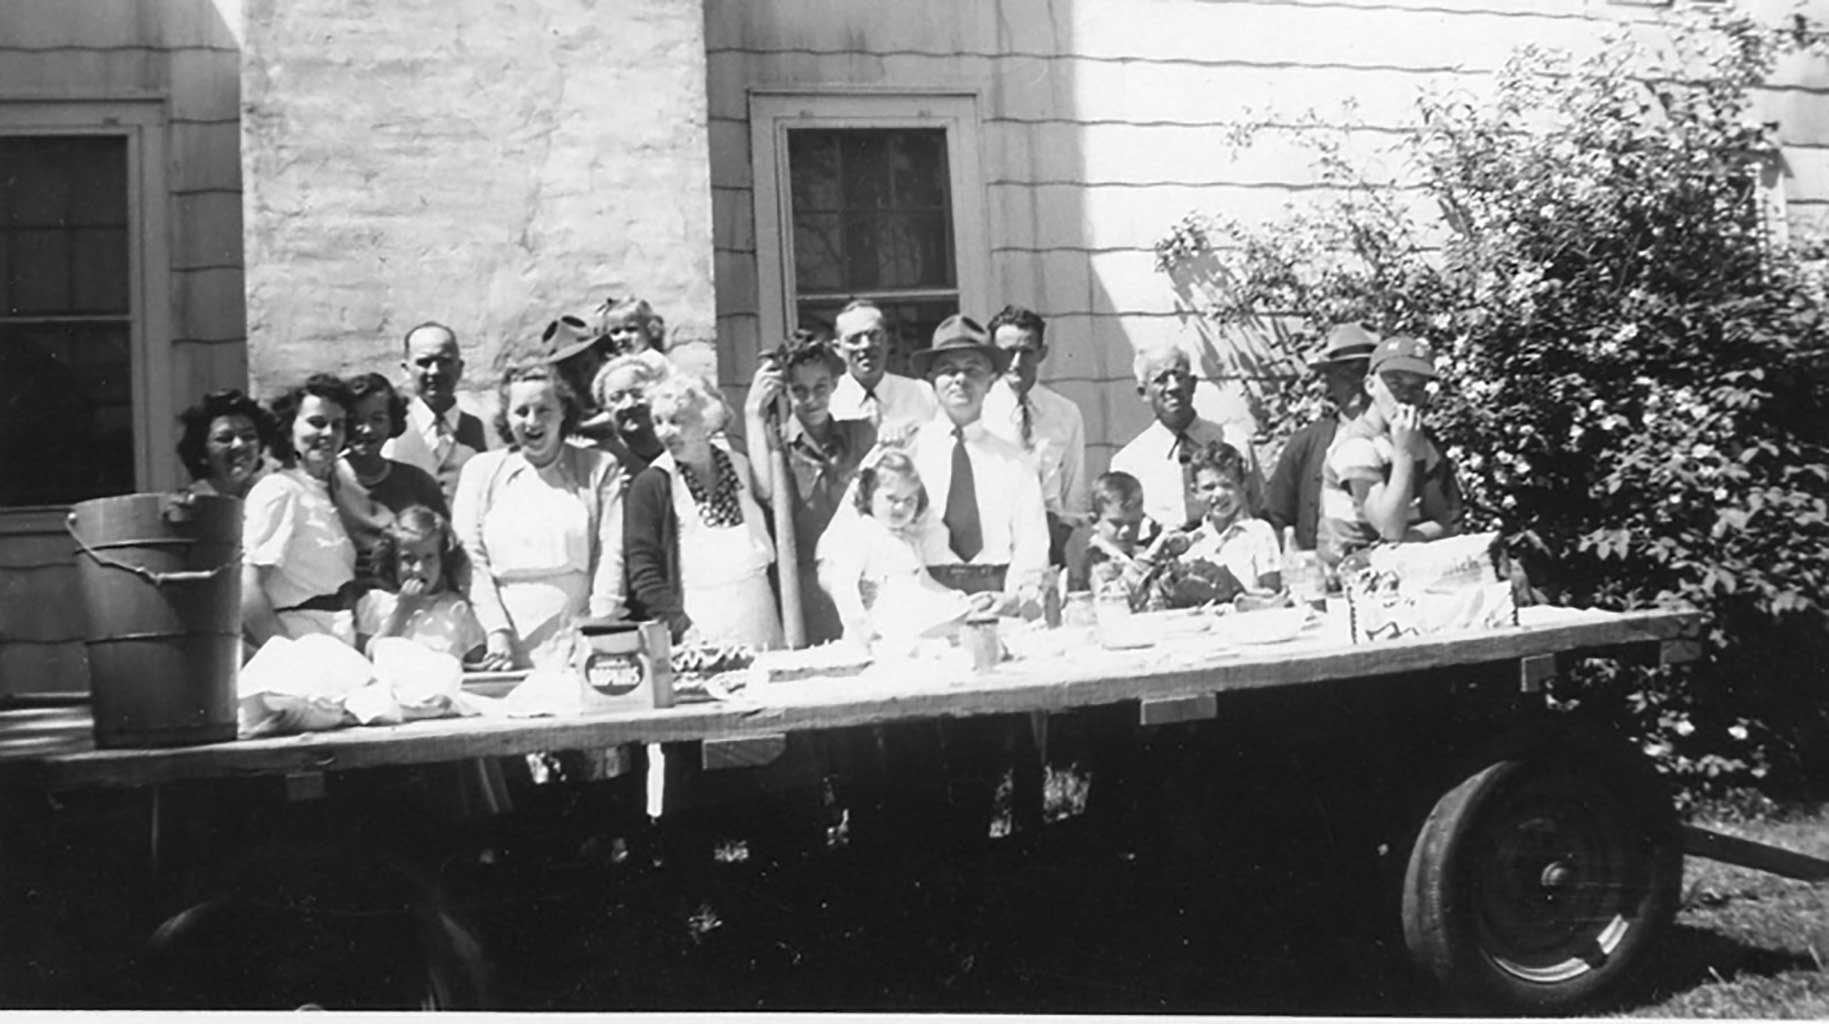 memorial-day-family-picnic-1950-img780